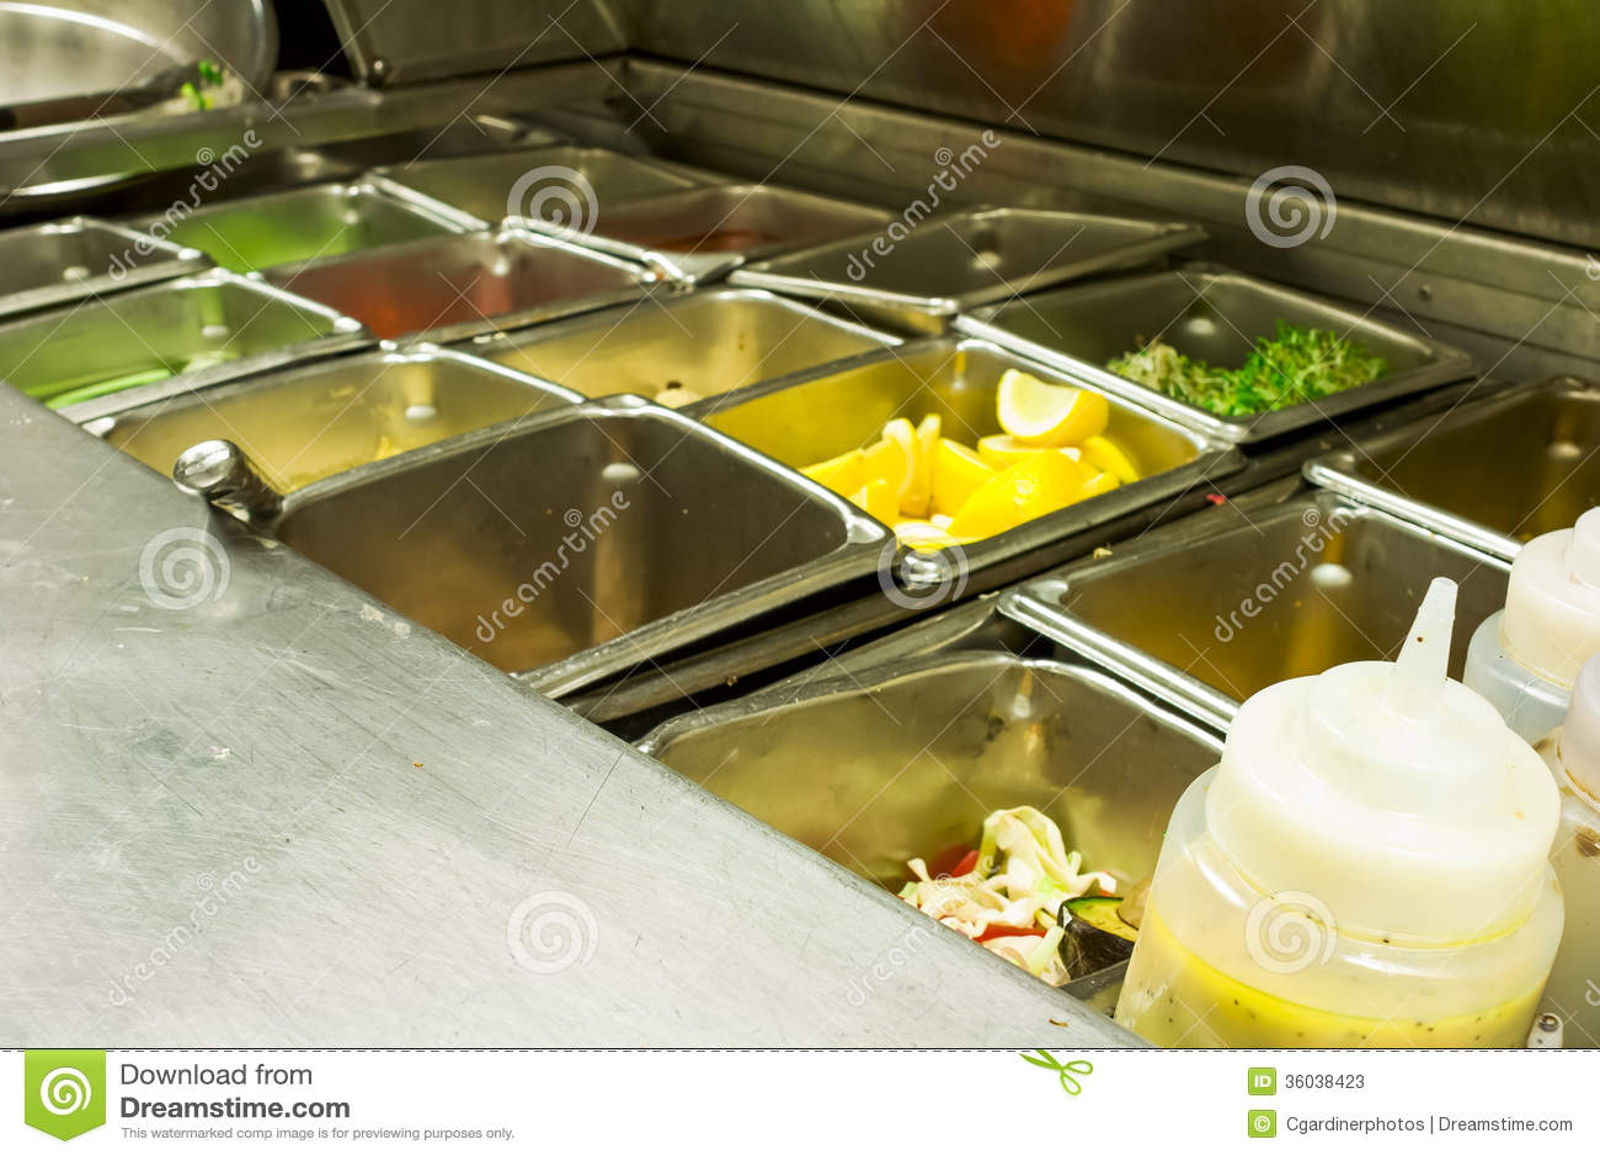 Restaurant Kitchen Layout Restaurant Kitchen Layout Stock Photo Image 36038410